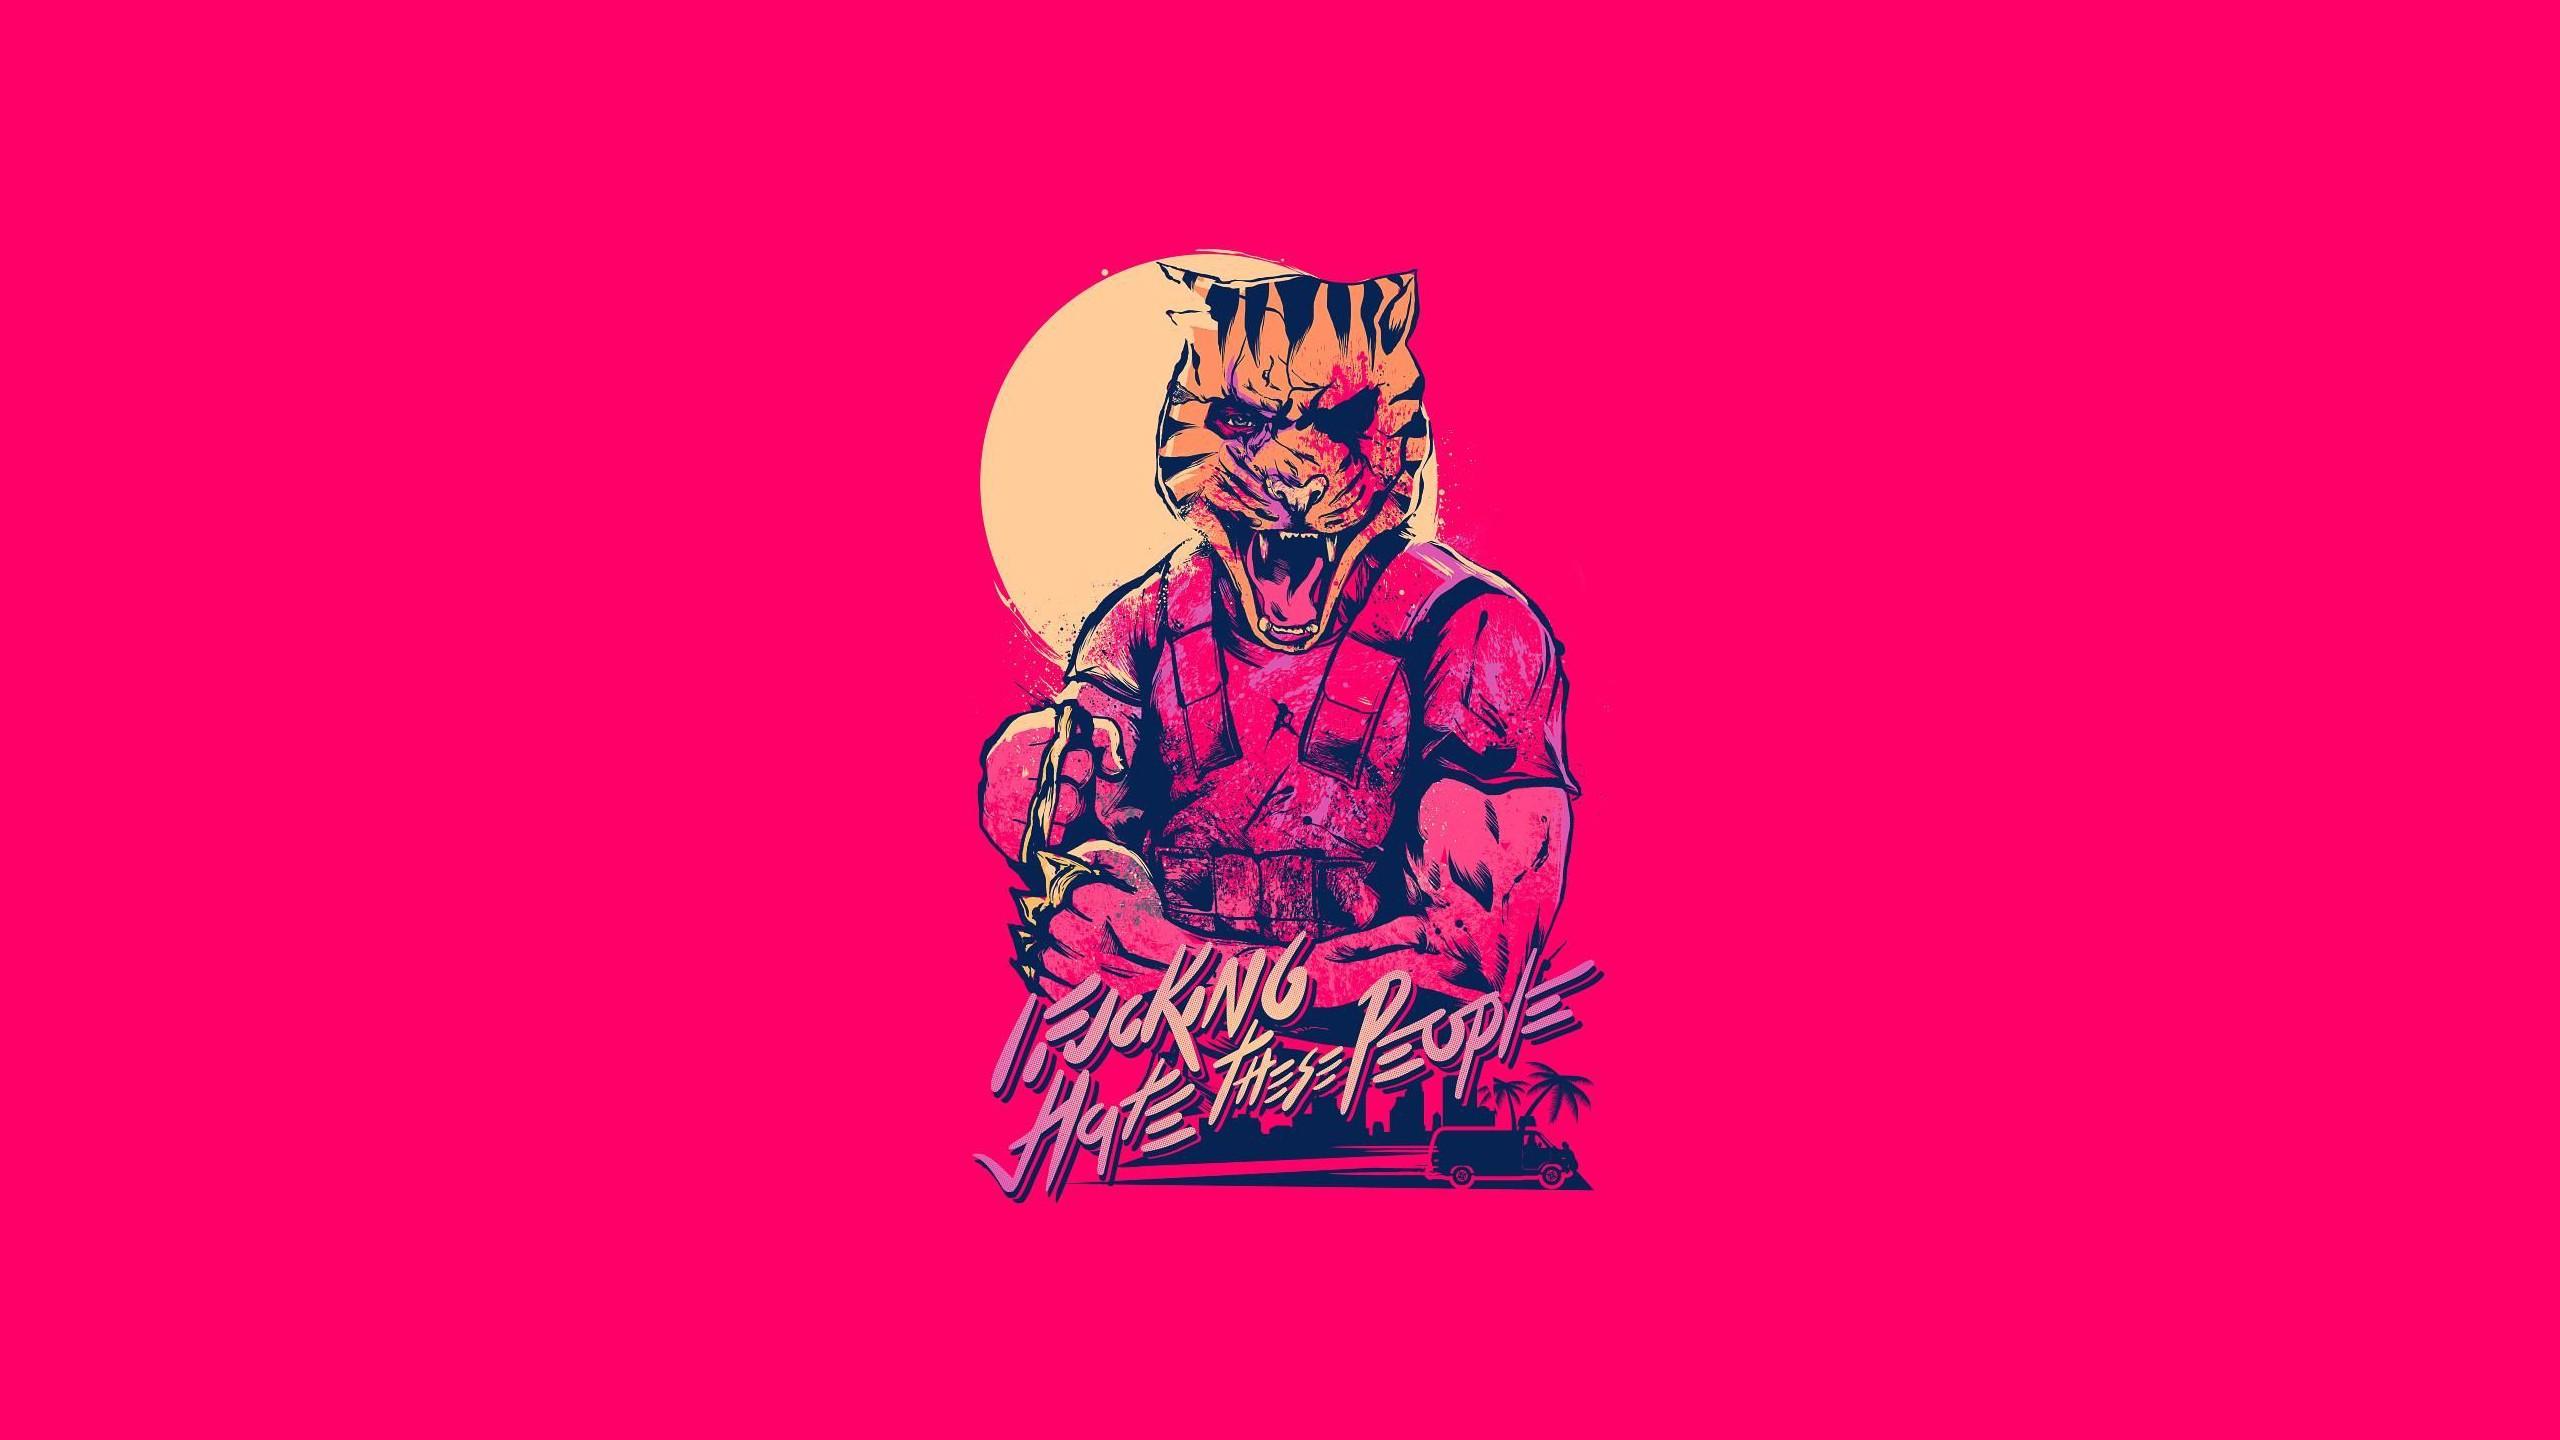 hotline miami wallpapers ·①